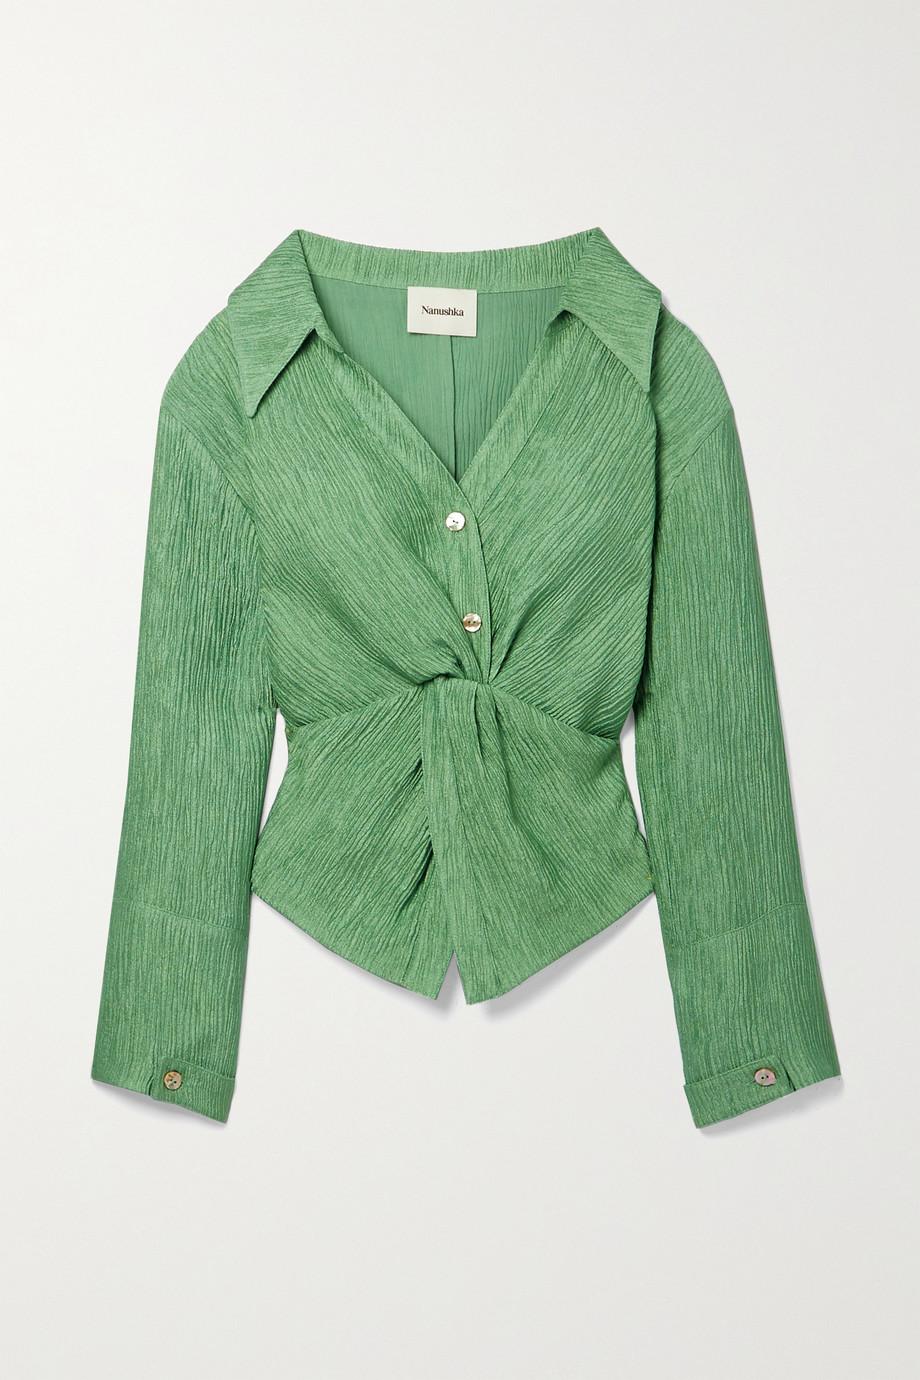 Nanushka Idris twist-front metallic plissé-crepe shirt